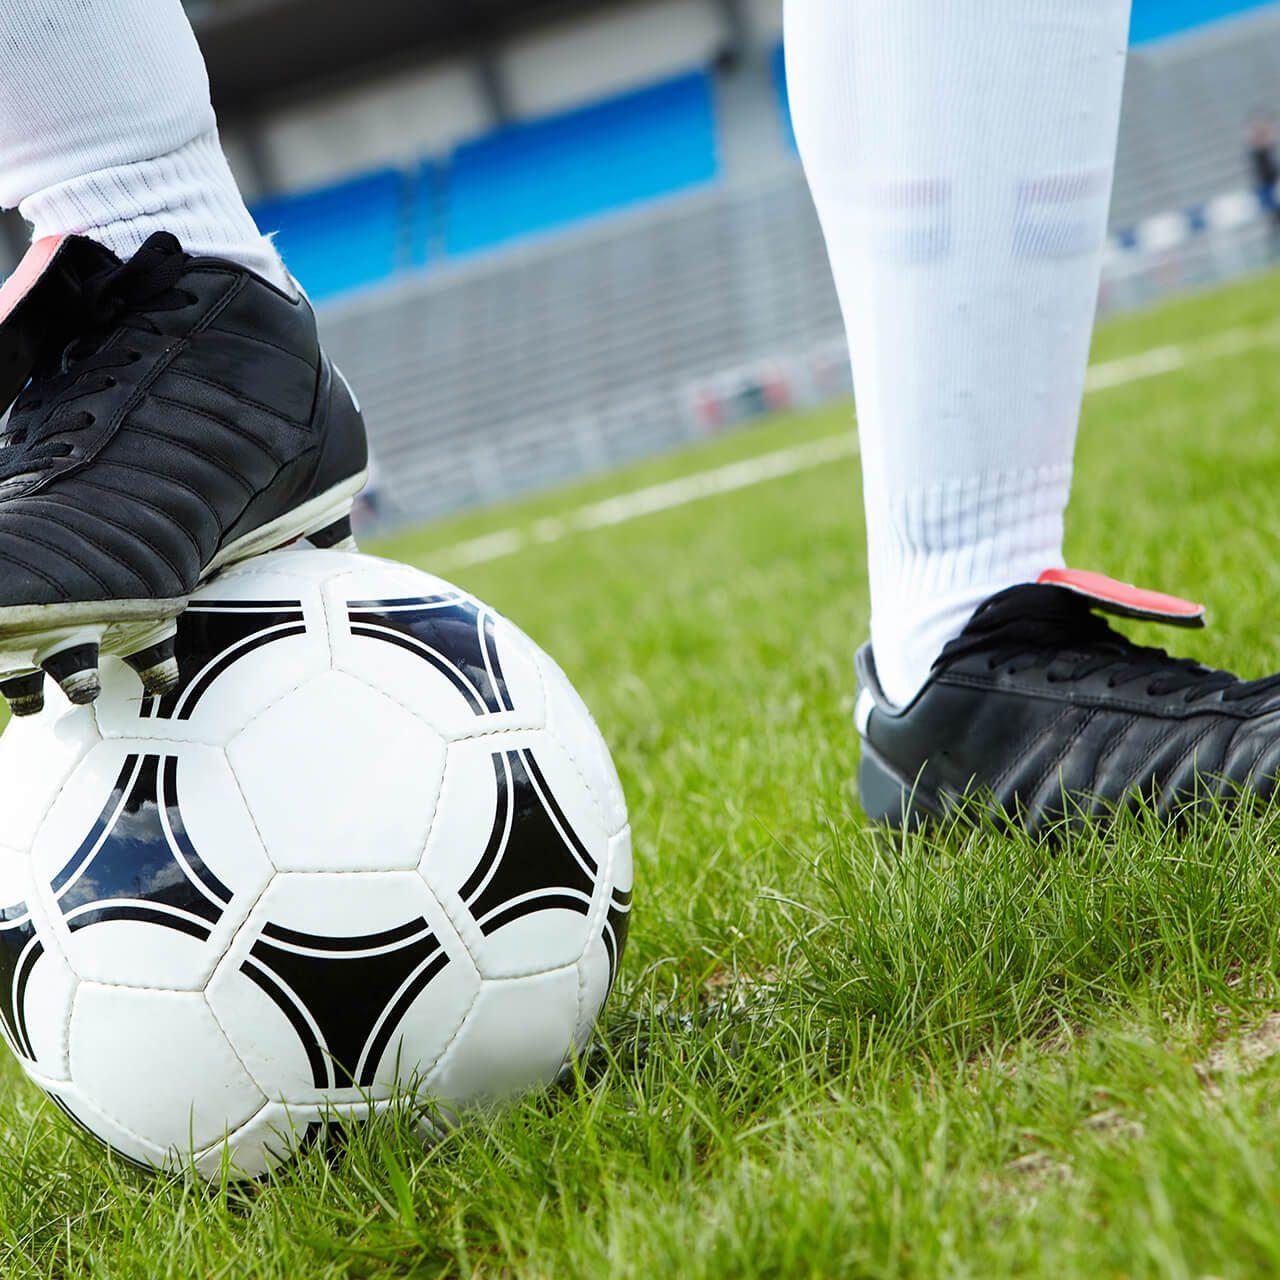 Feet on soccer ball